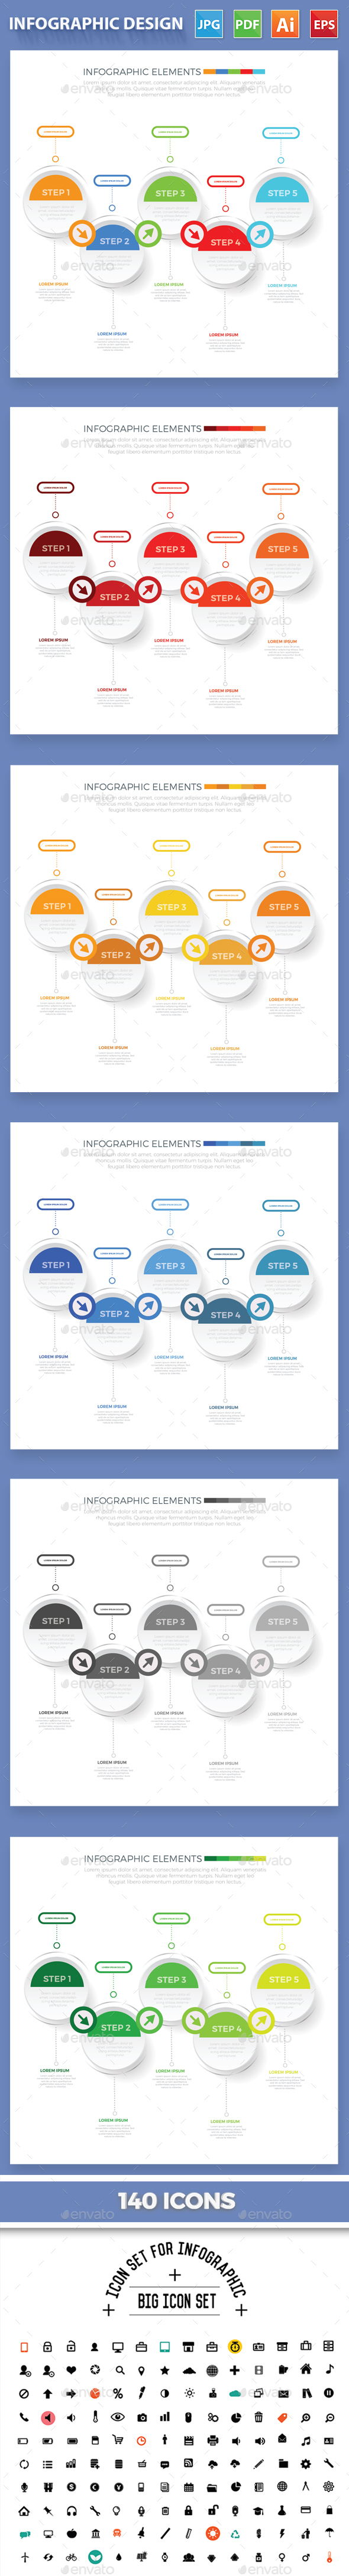 5 Steps Infographic Design - Infographics